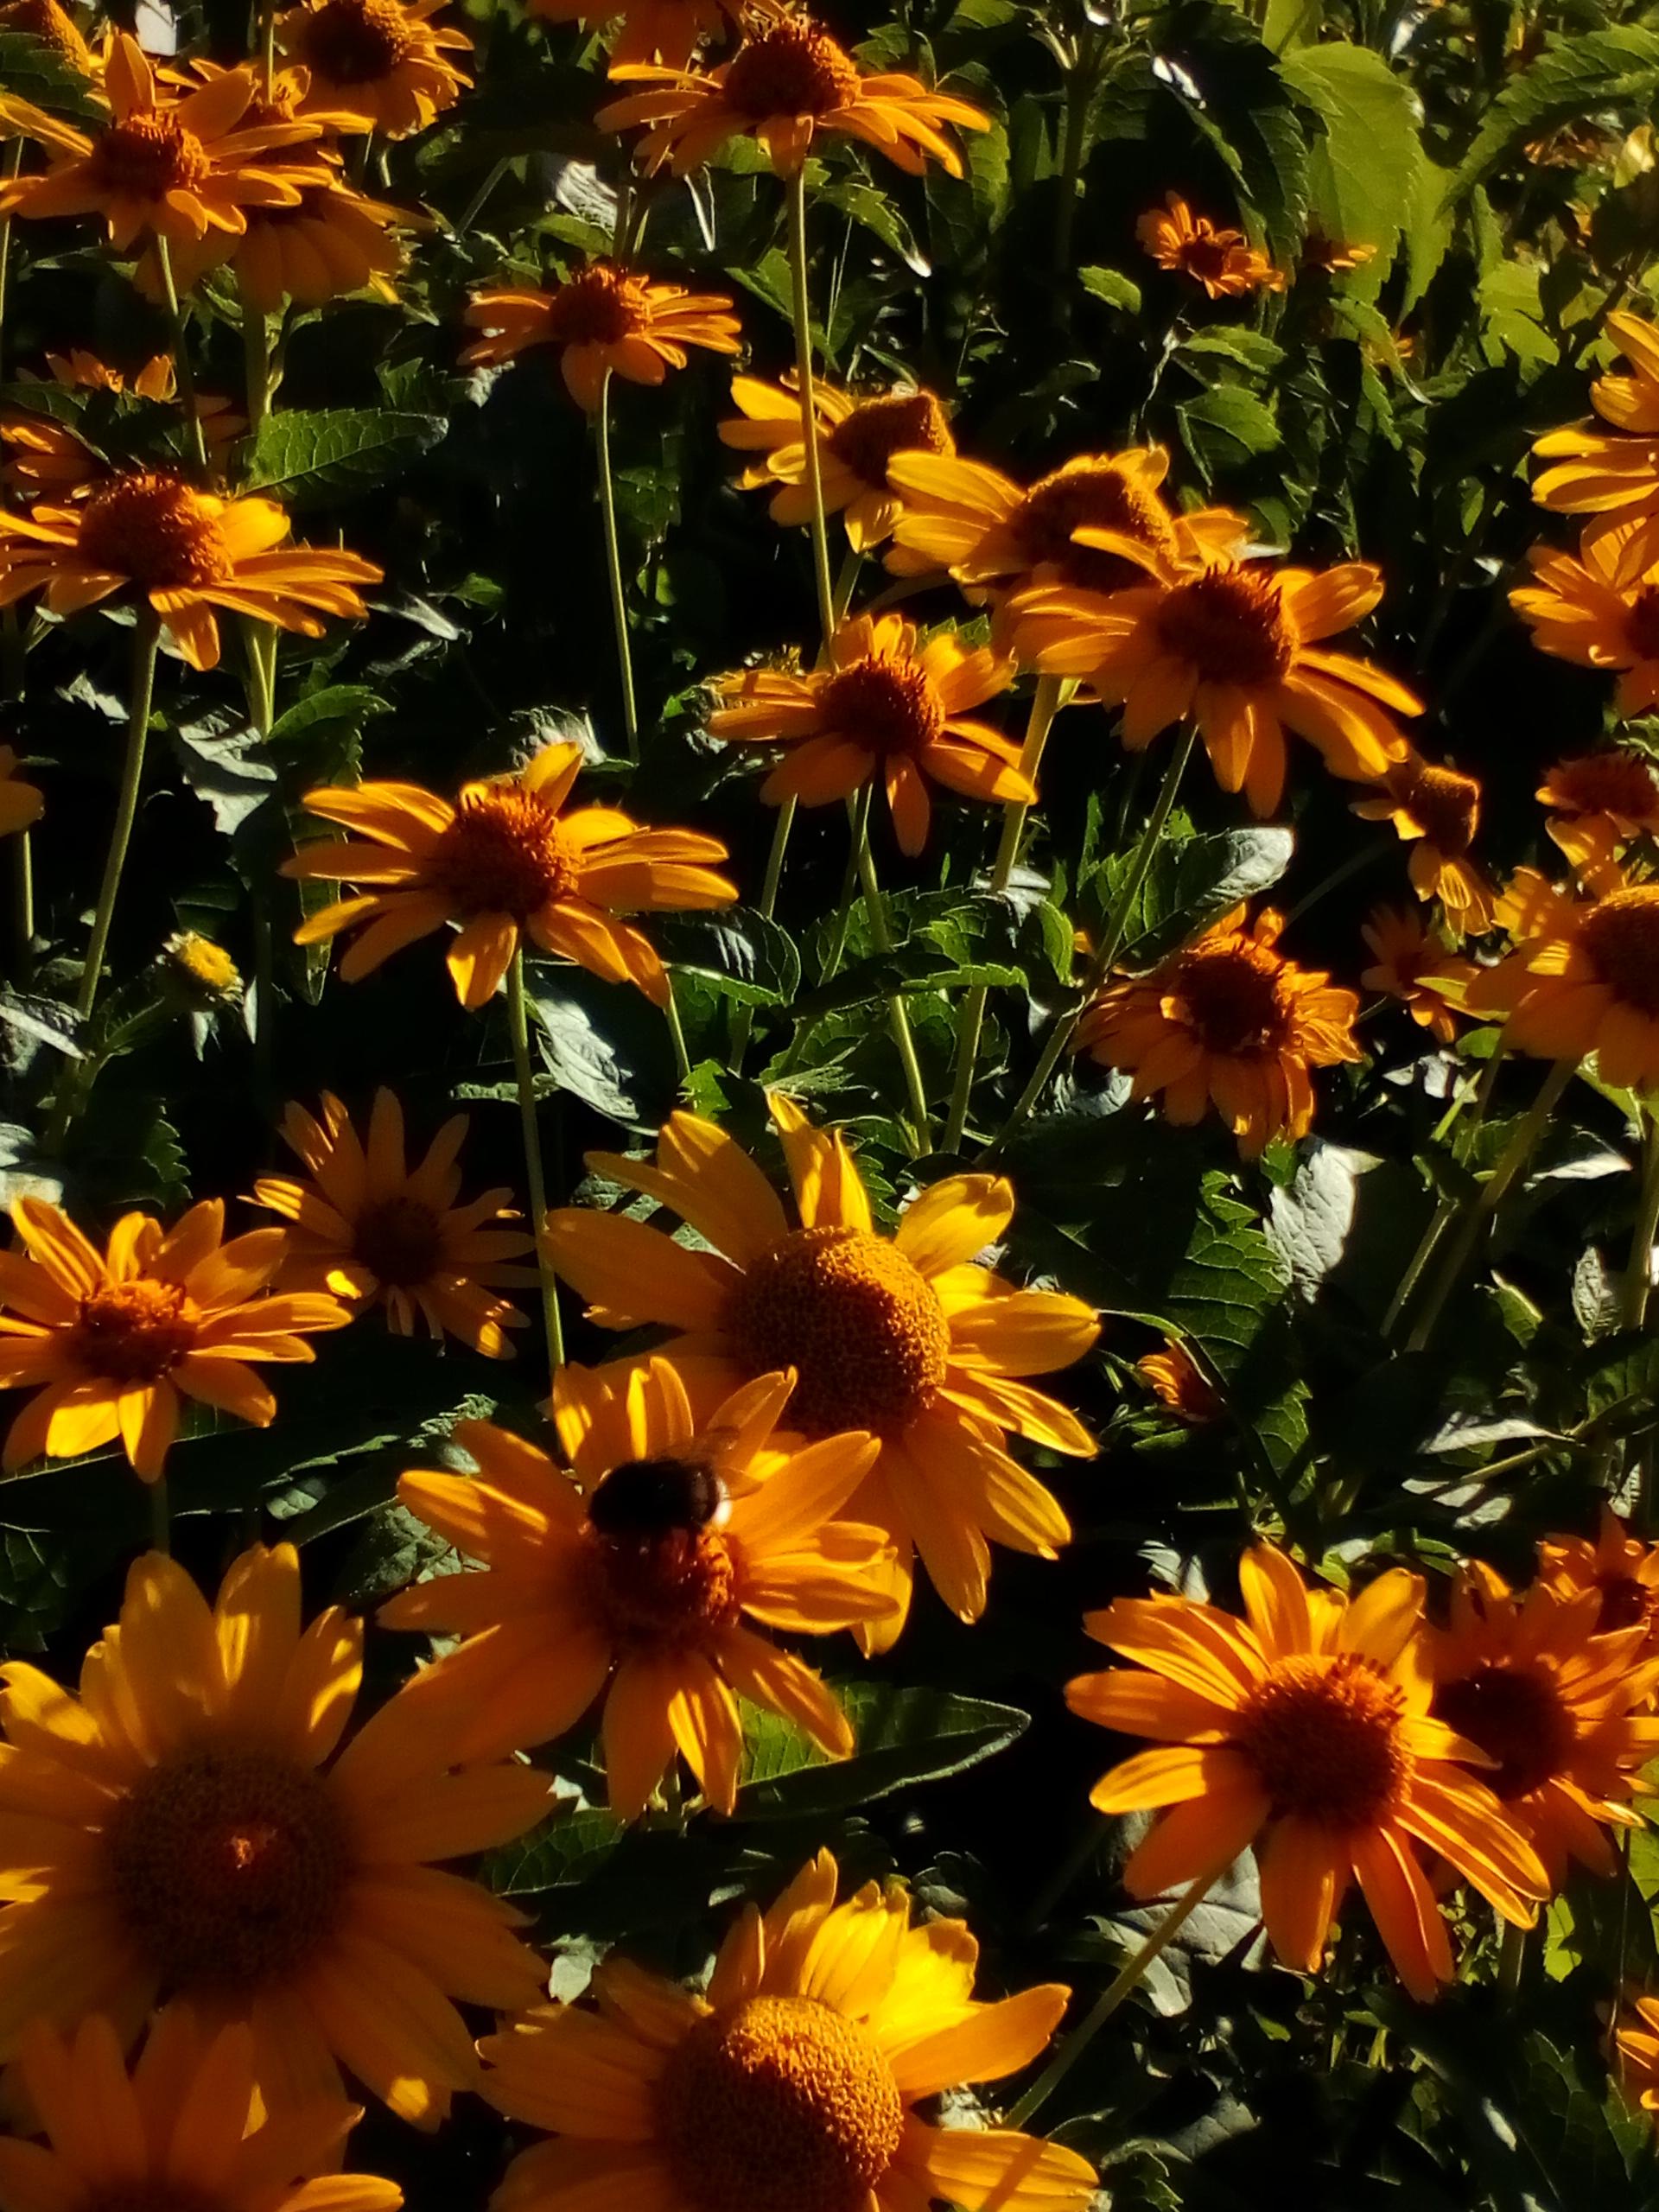 желтое лето. Блиц: желтые цветы